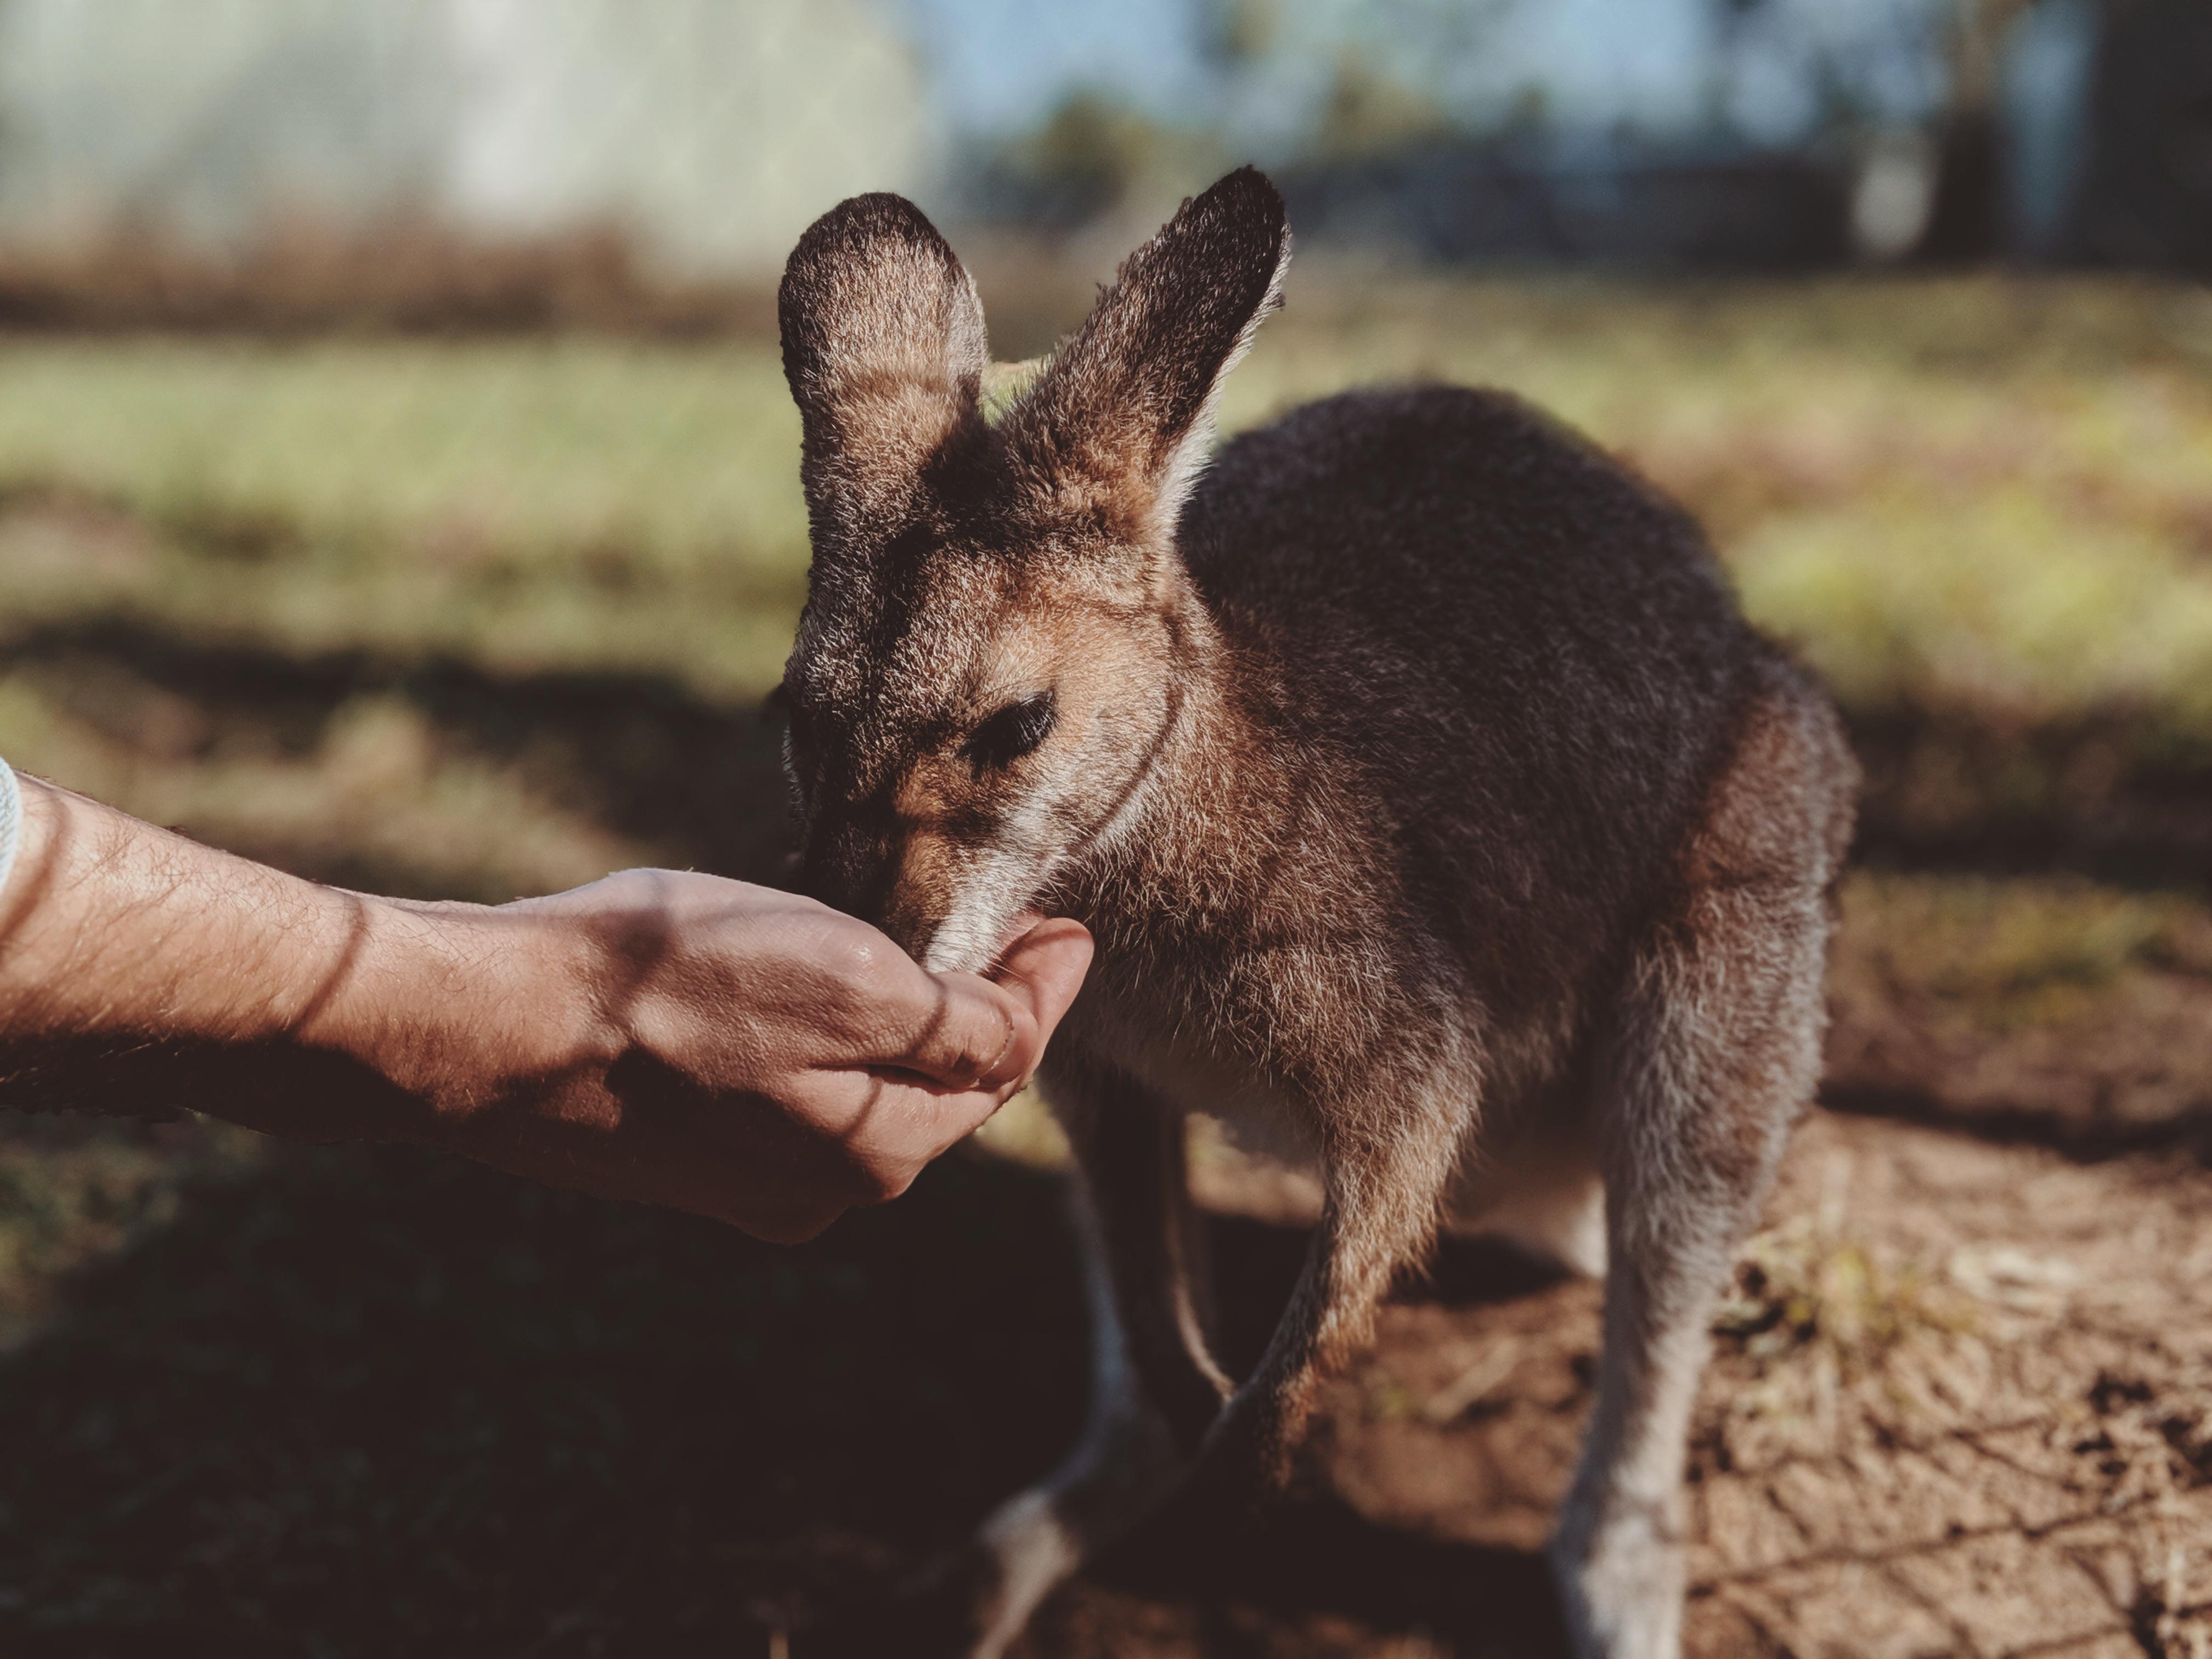 Close-Up Photo of Person's Hand Feeding a Kangaroo